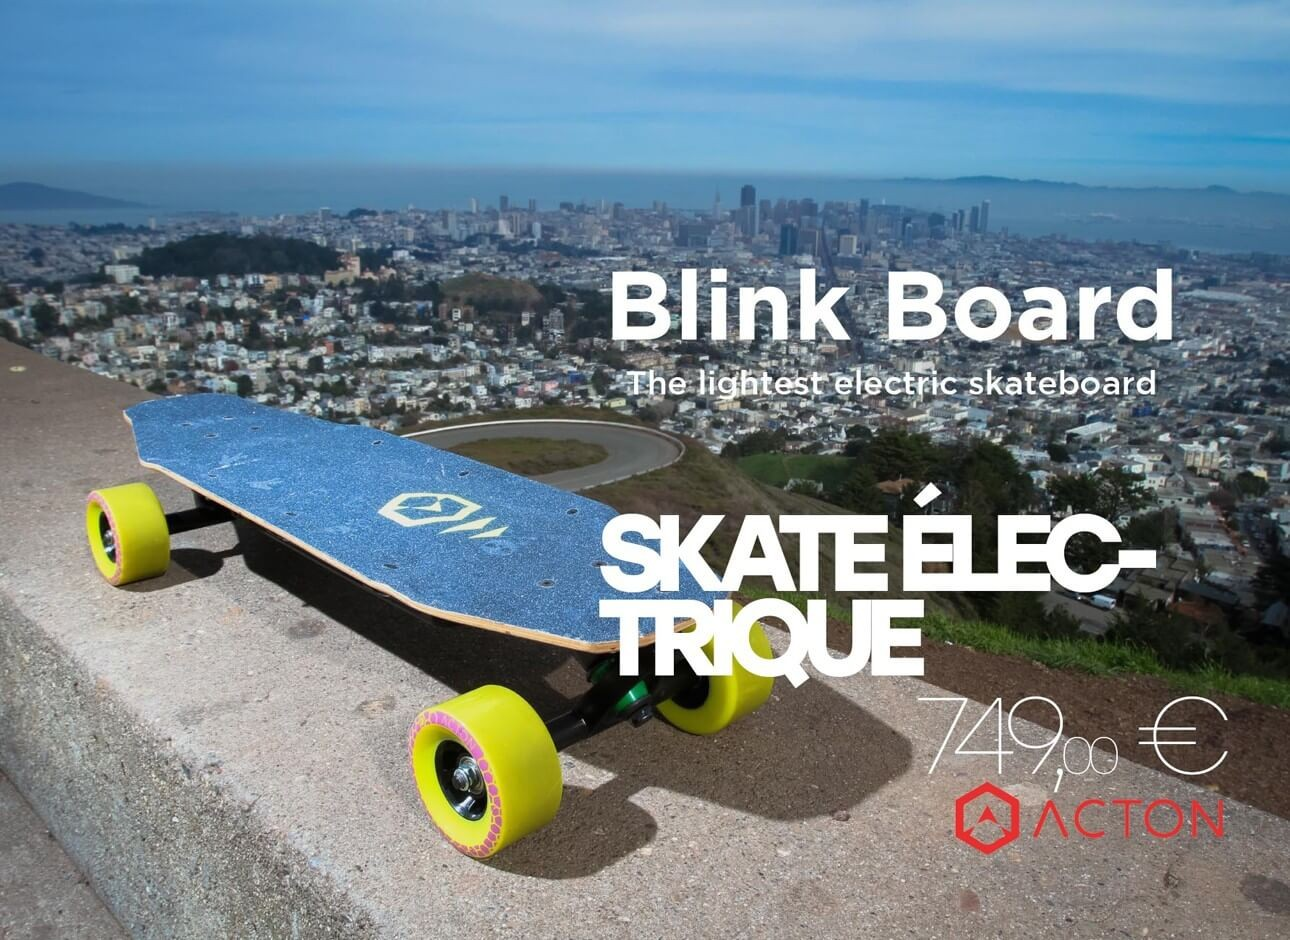 blink board, skateboard électrique de Acton